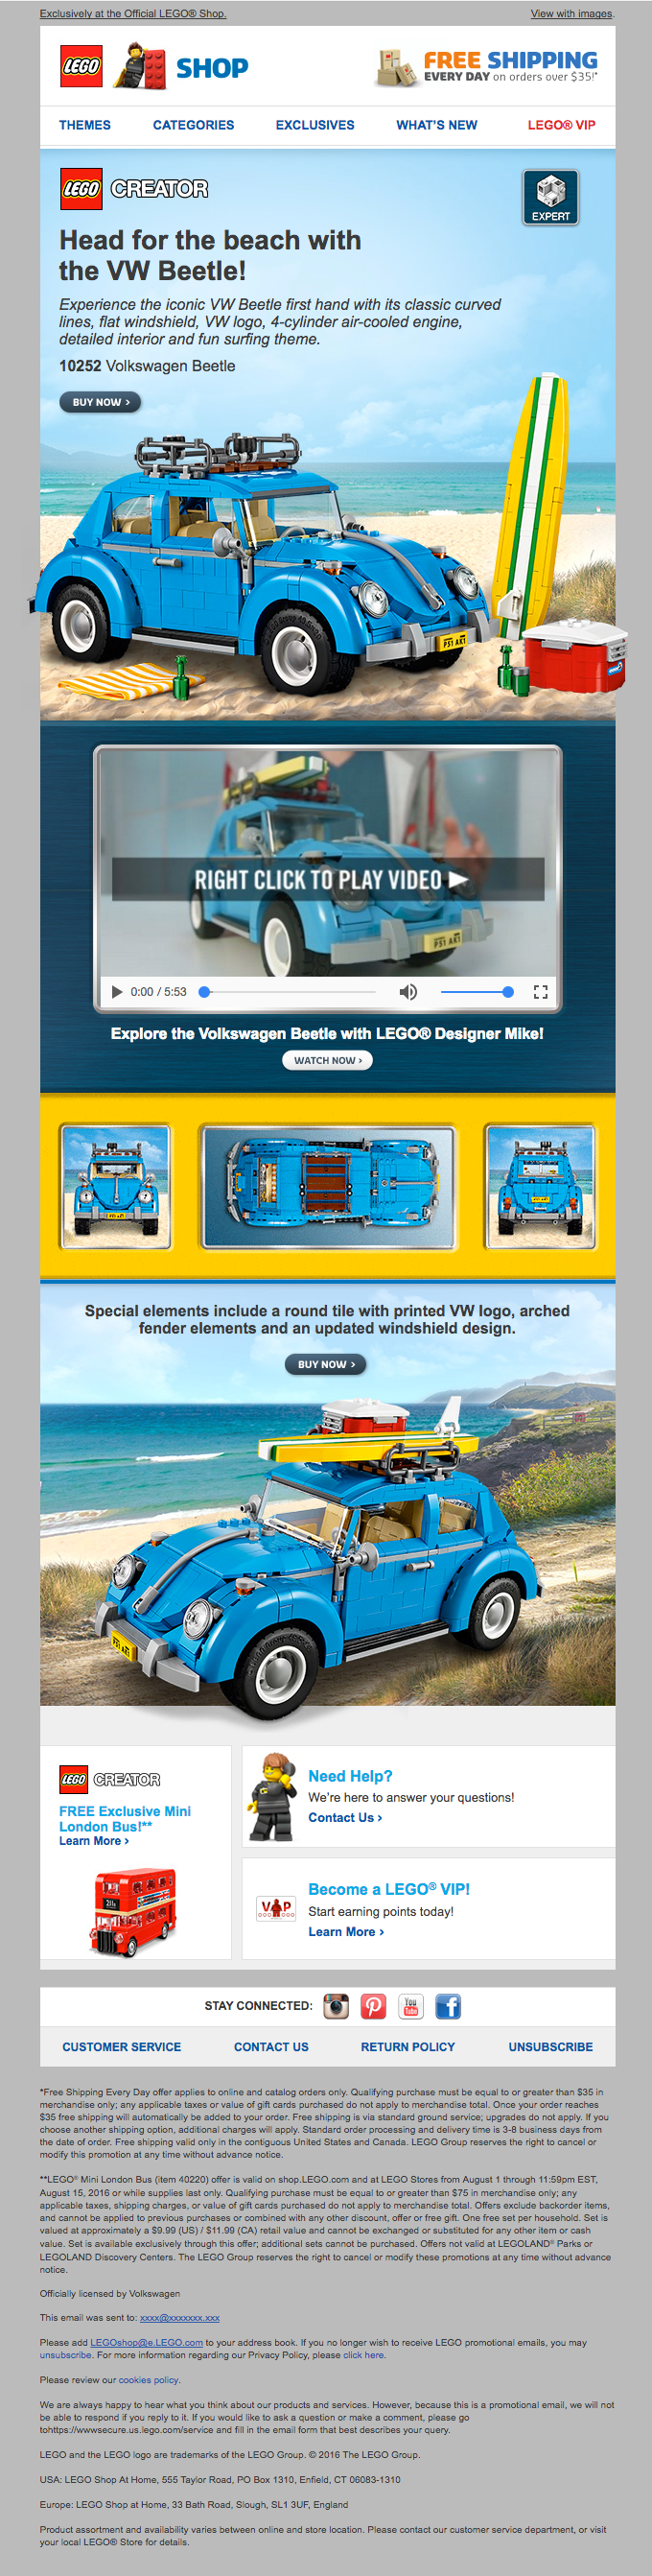 New Exclusive LEGO® Creator Volkswagen Beetle now available!